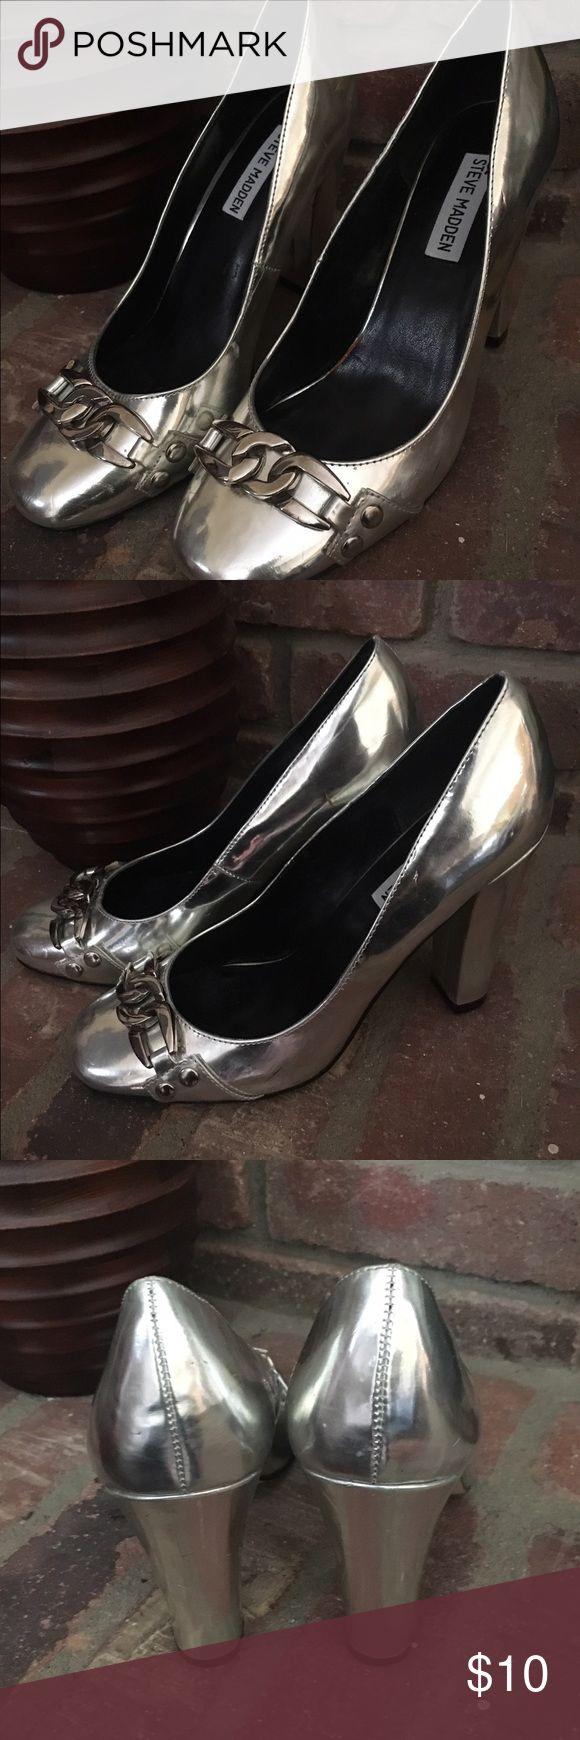 Silver Steve Madden Pumps Beautiful blocked heeled pumps.  Super cute and super on trend. Steve Madden Shoes Heels